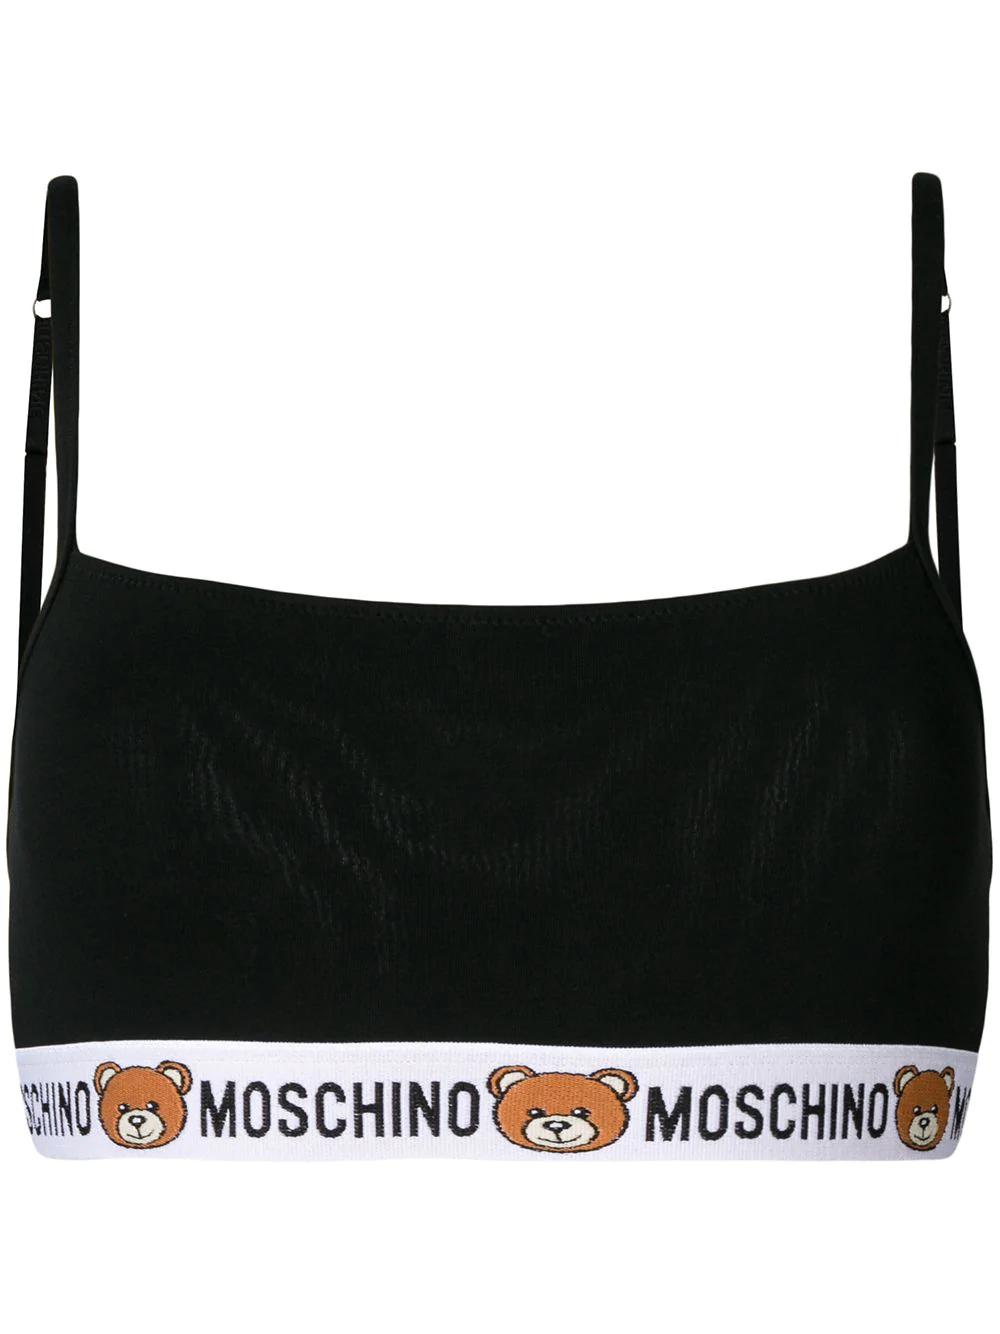 3f308cb51746d Moschino Teddy Bear Bra - Black